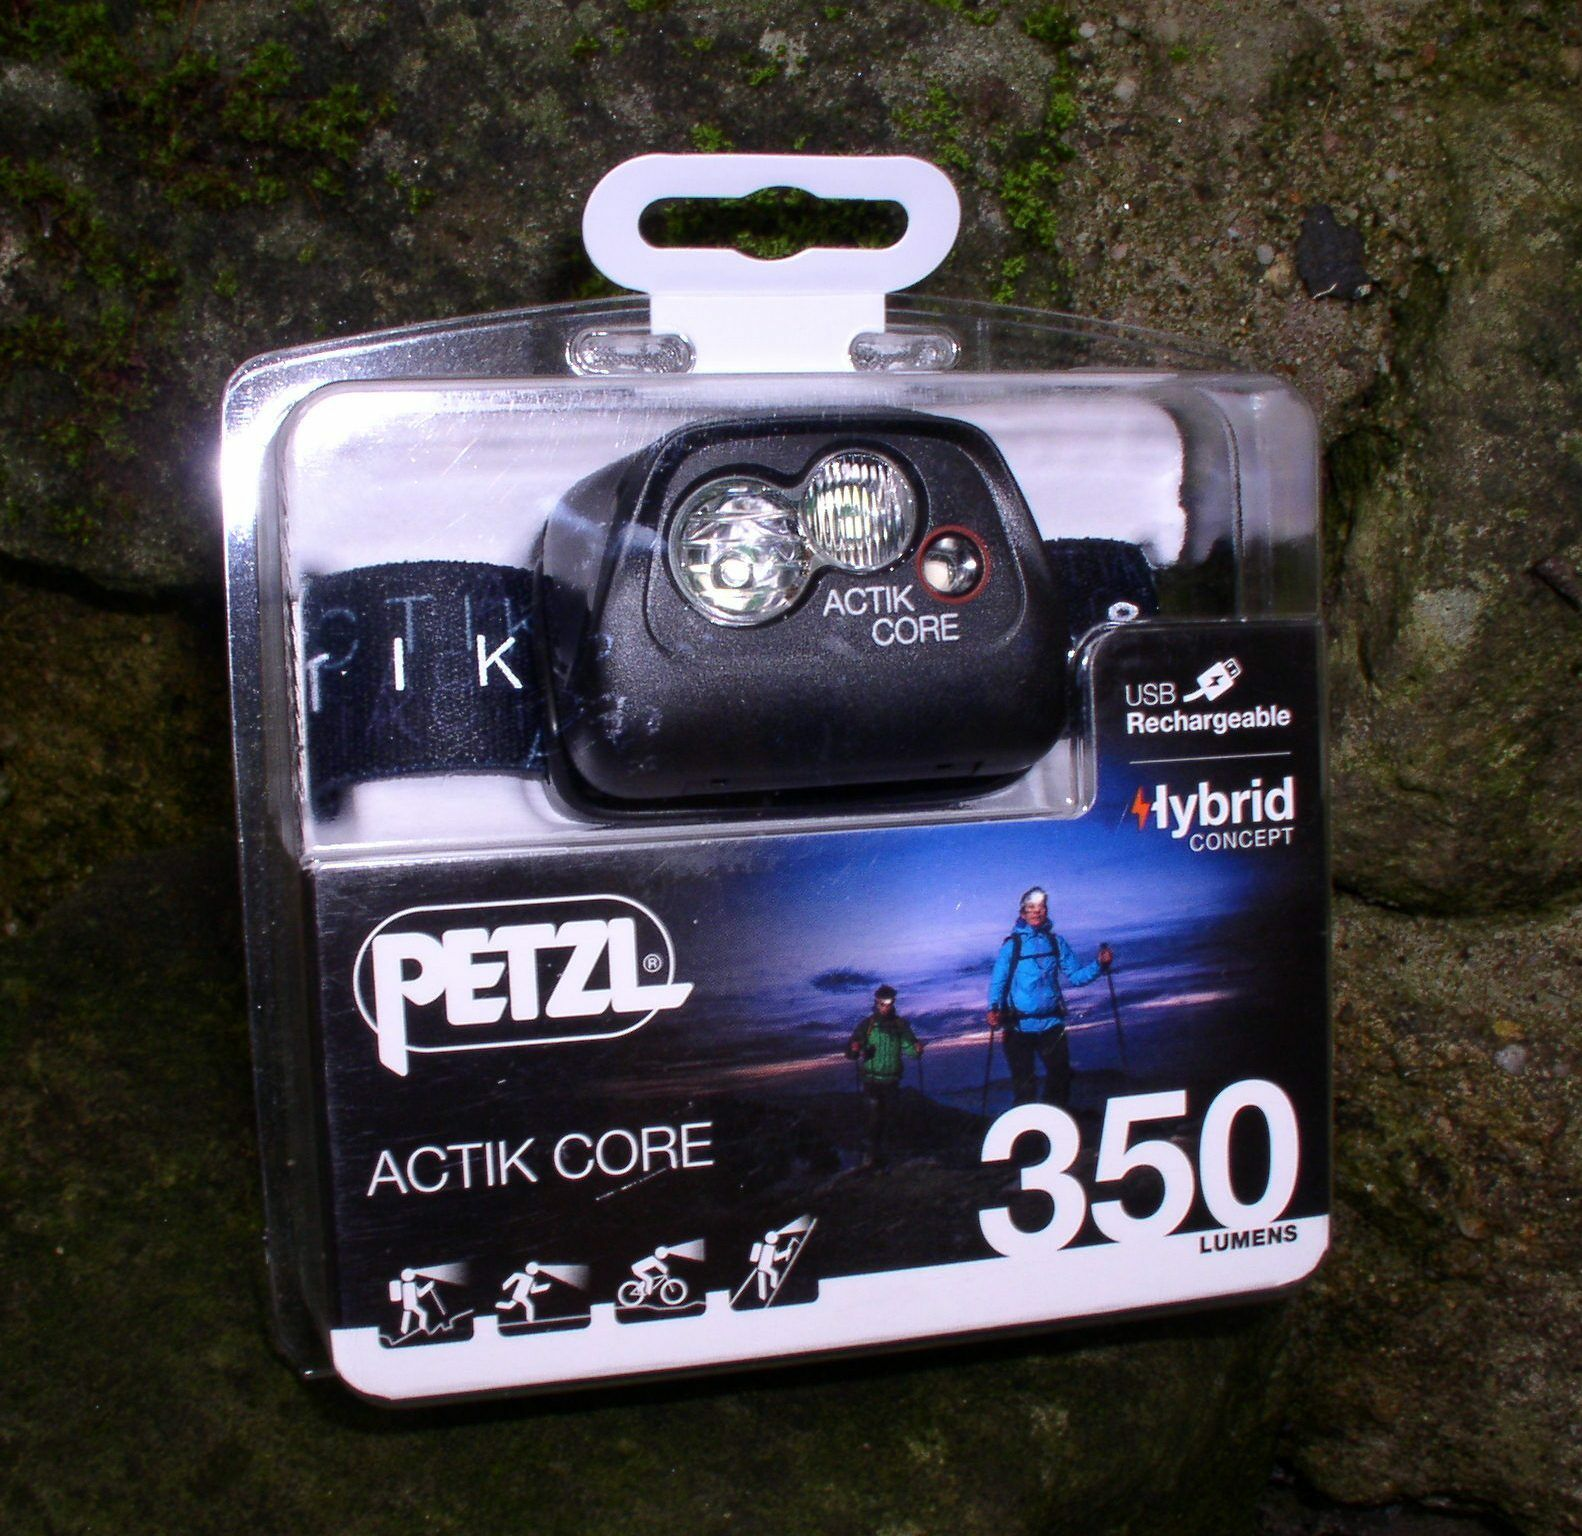 Petzl Actik Core - Aktive Stirnlampe in schwarz - 350 Lumen Kopflampe Headlight